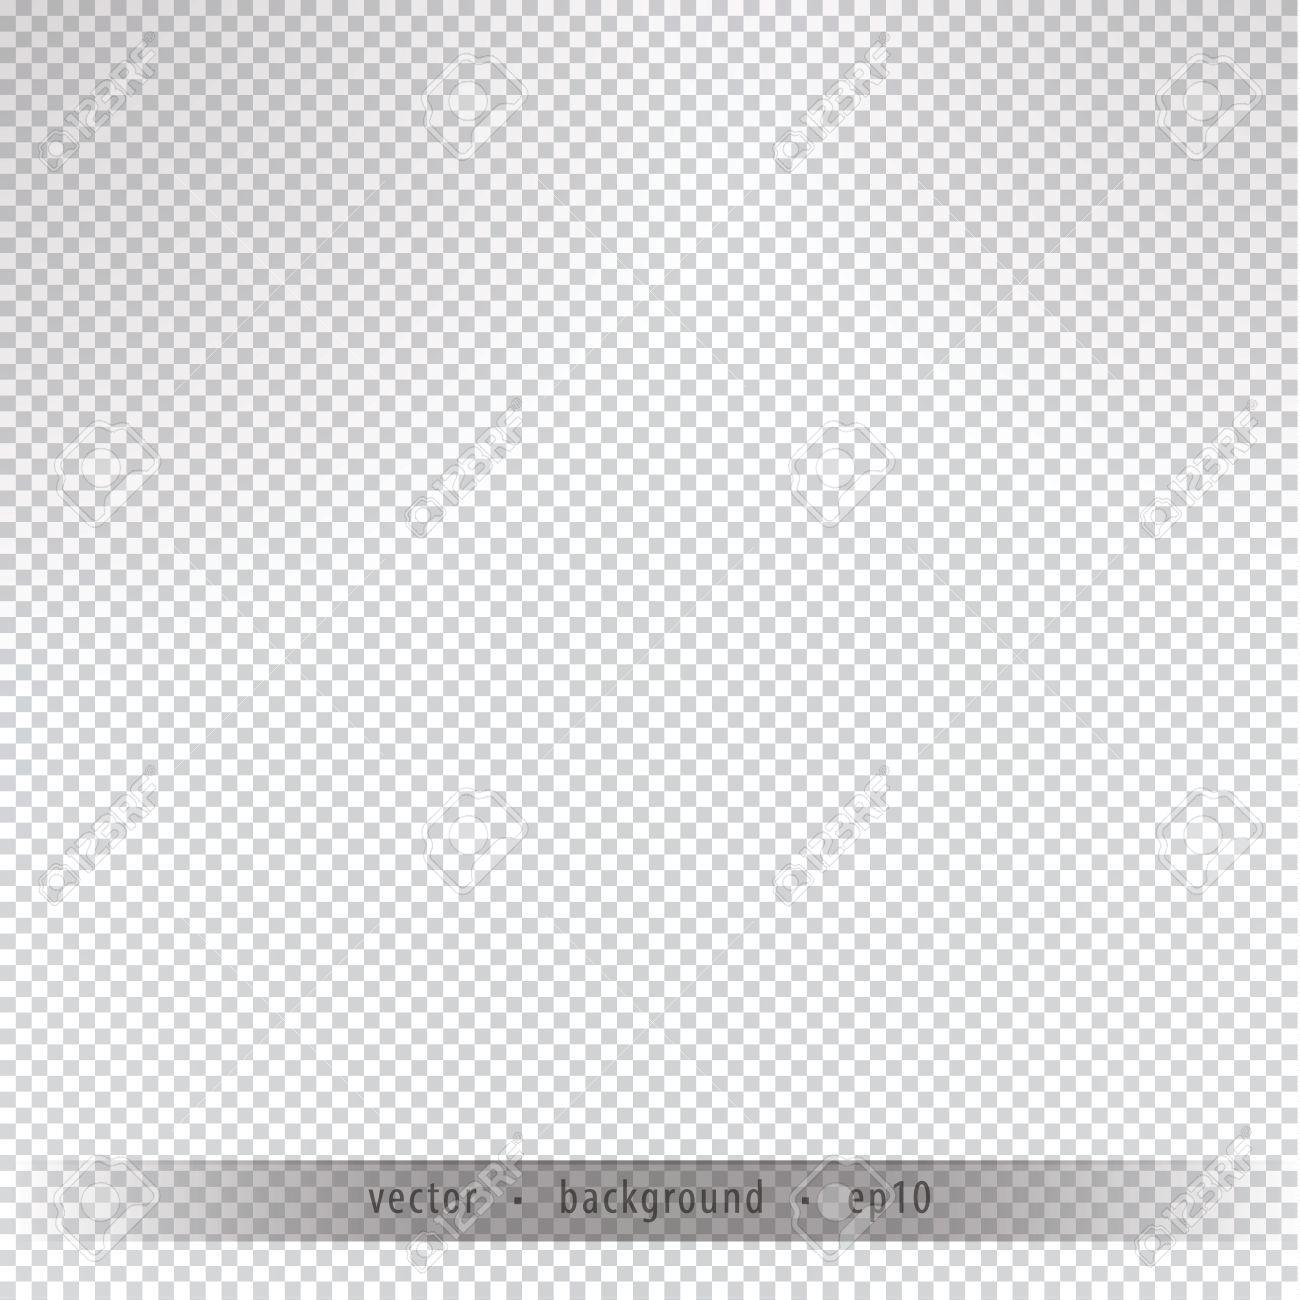 Background image transparency - Empty Vector Background Transparency Wallpaper Concept Digital Design Sameless